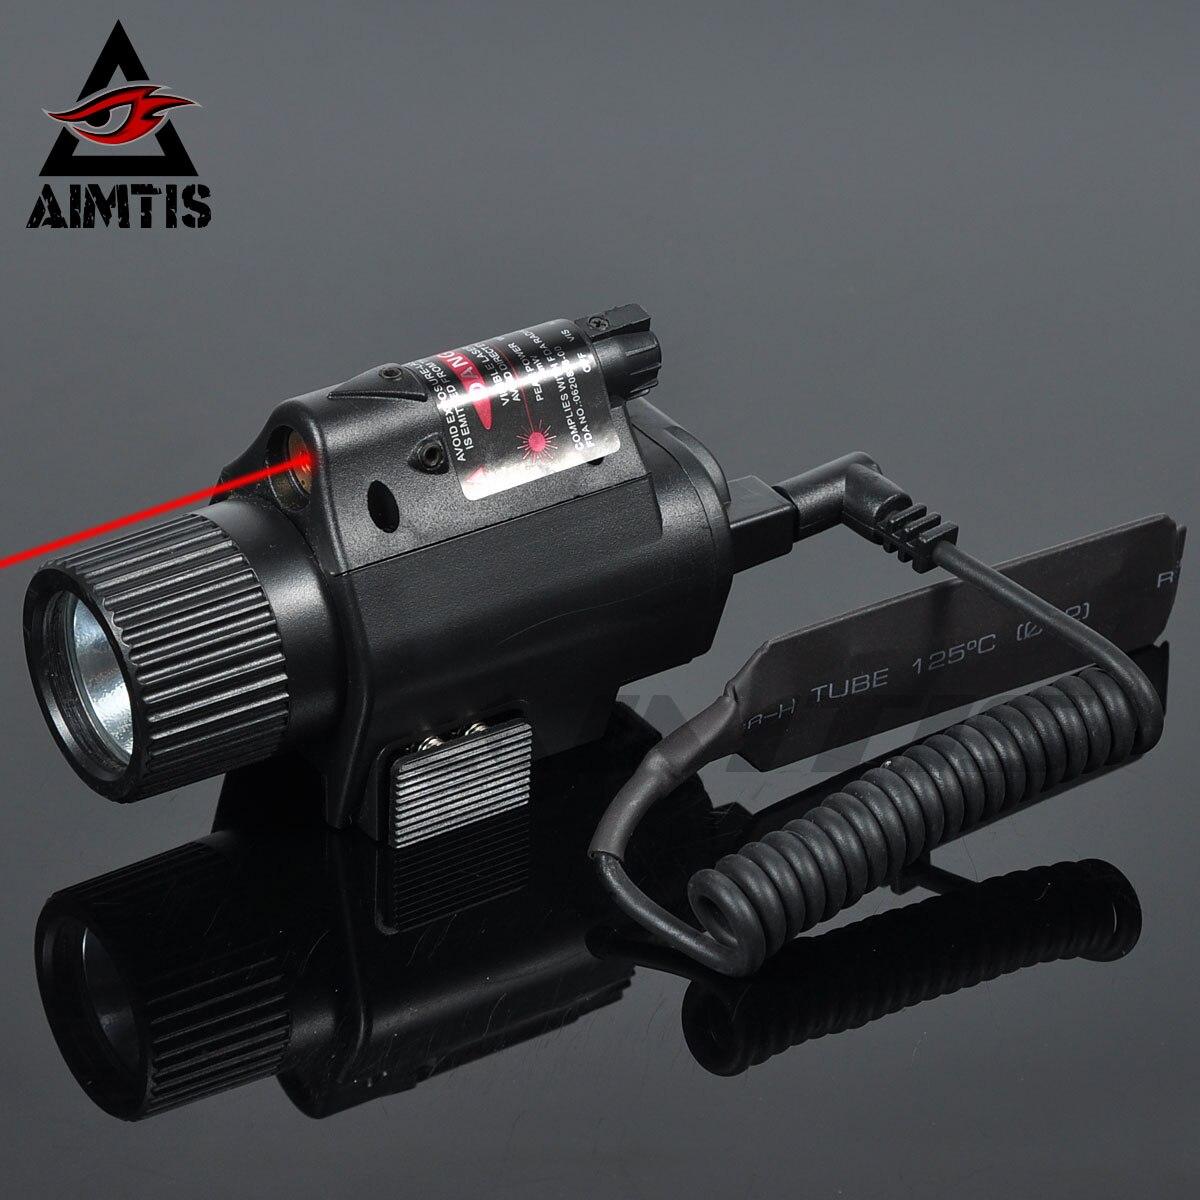 Aimtis ミニ glock ピストル銃ライト狩猟キャンプ銃照明機器懐中電灯戦術視力赤色レーザー led 懐中電灯